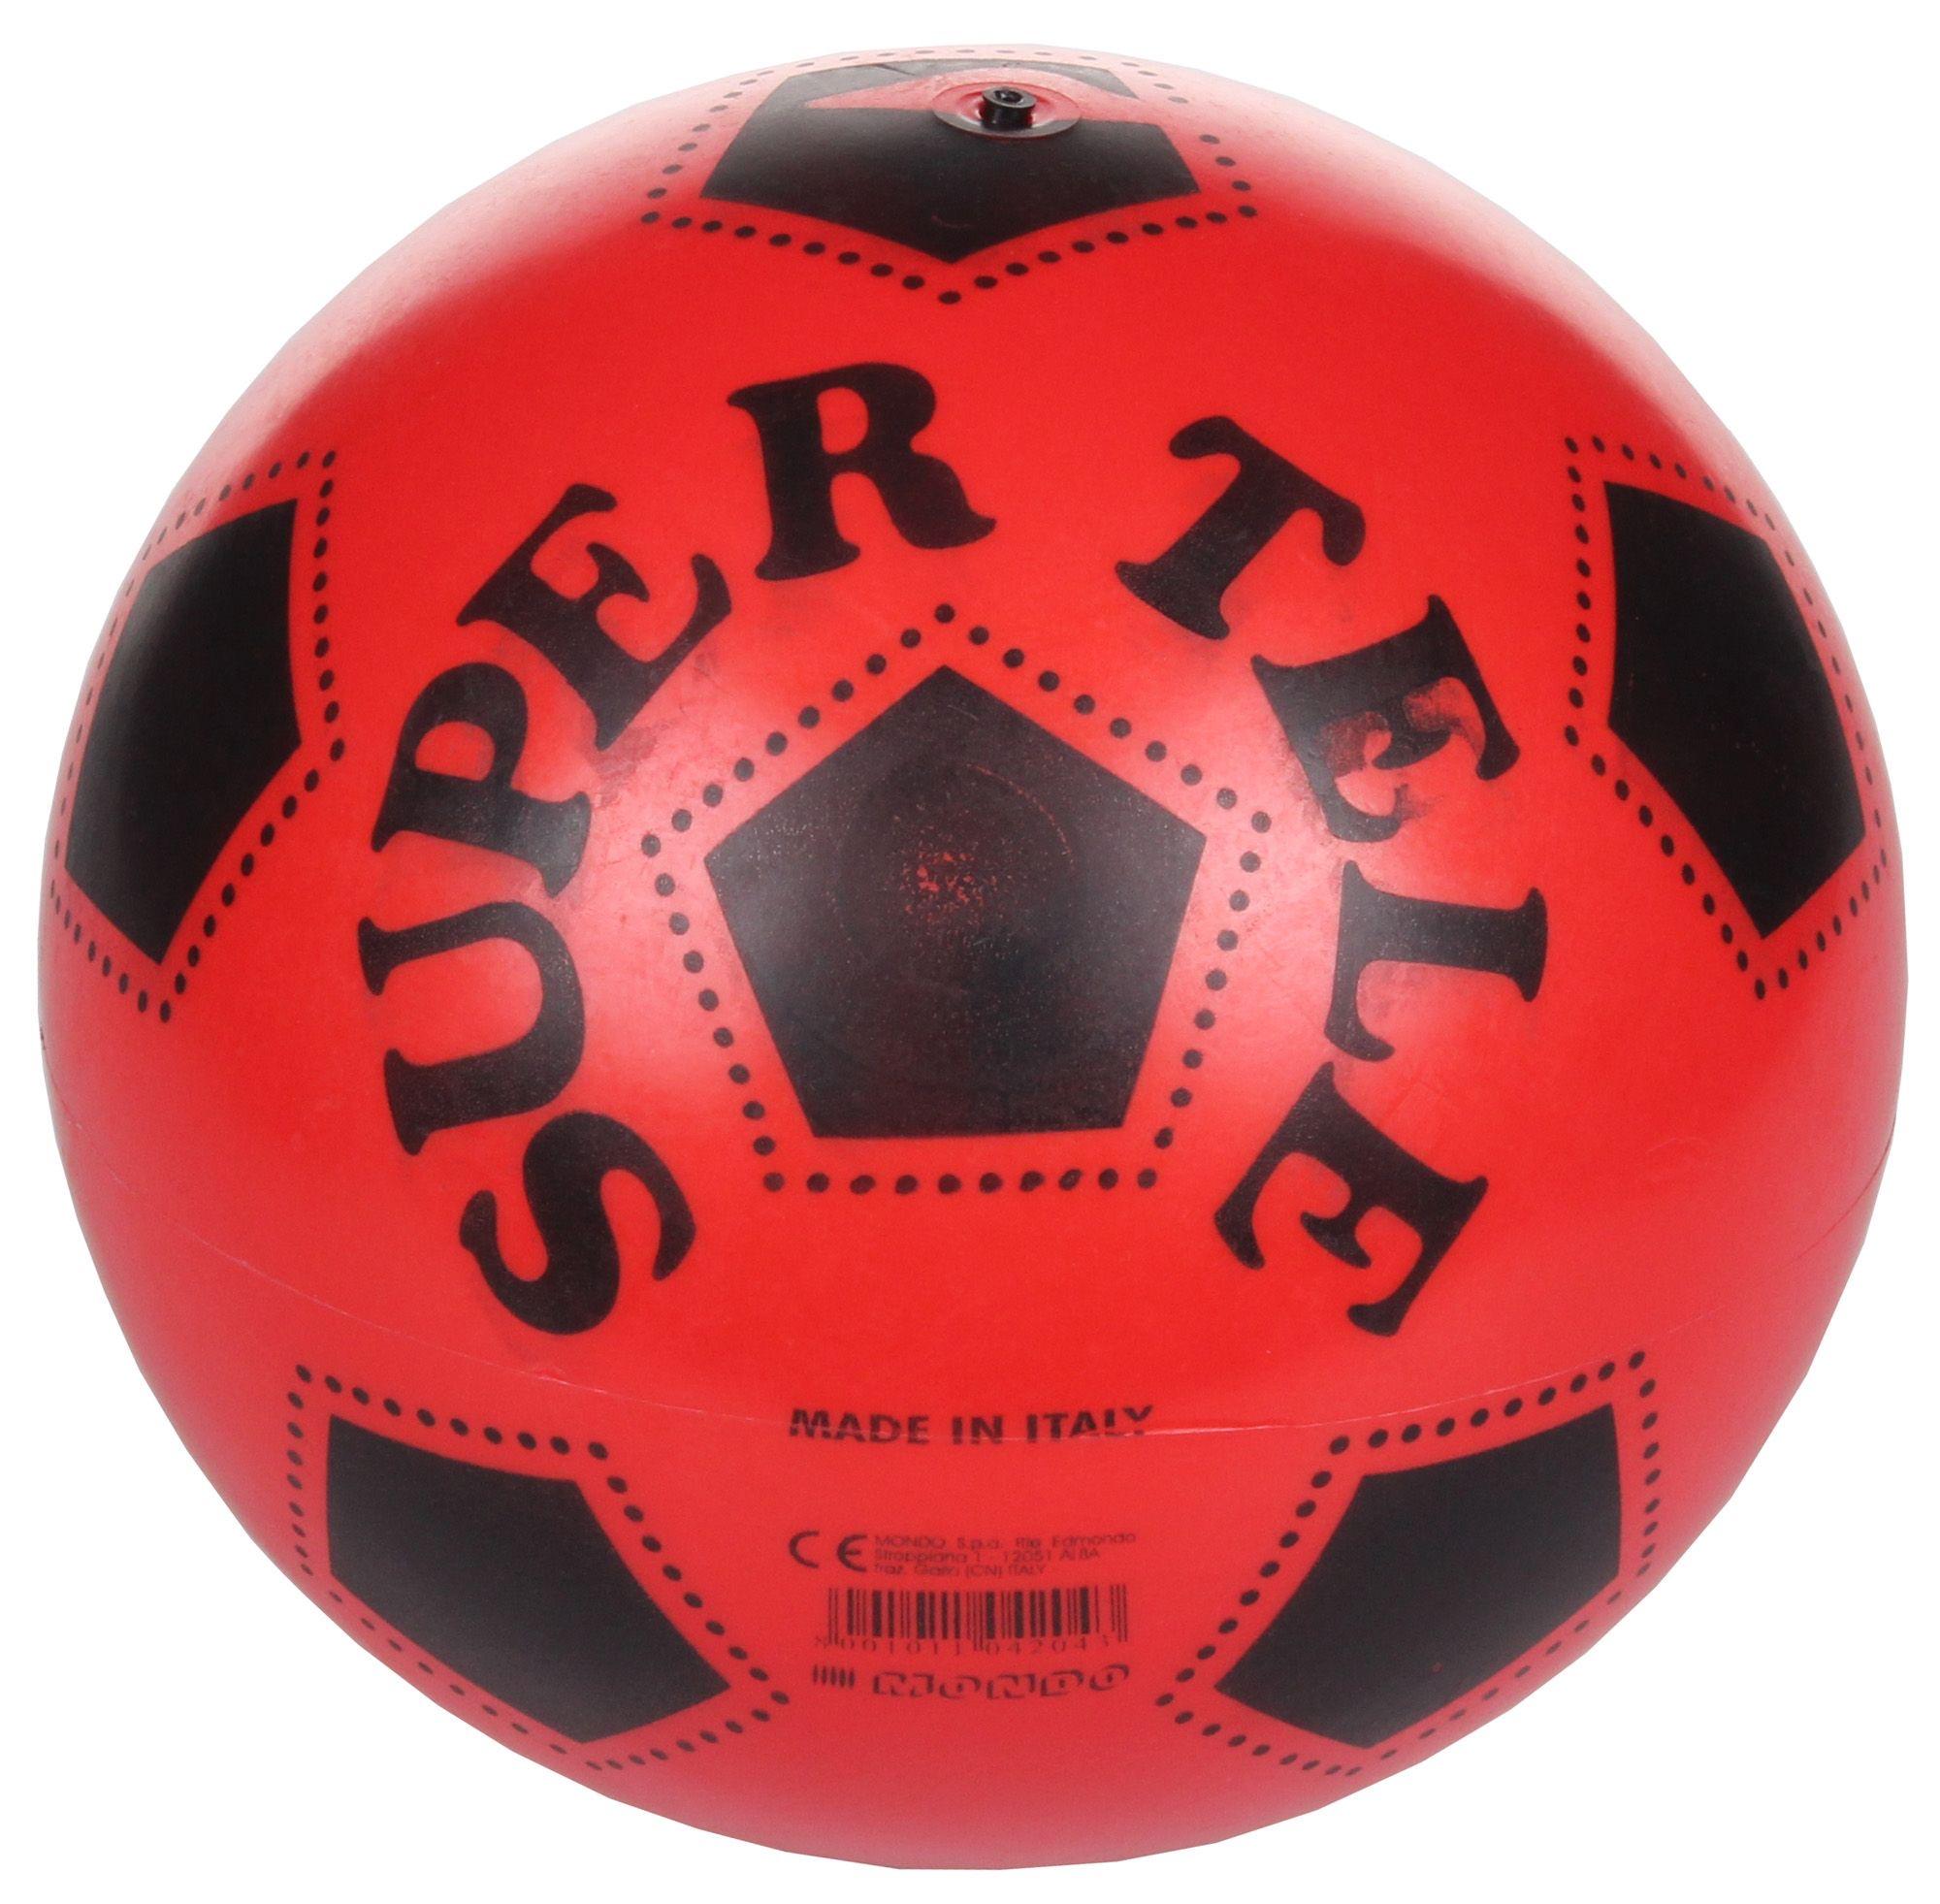 How do you make this ball (felele) stronger?